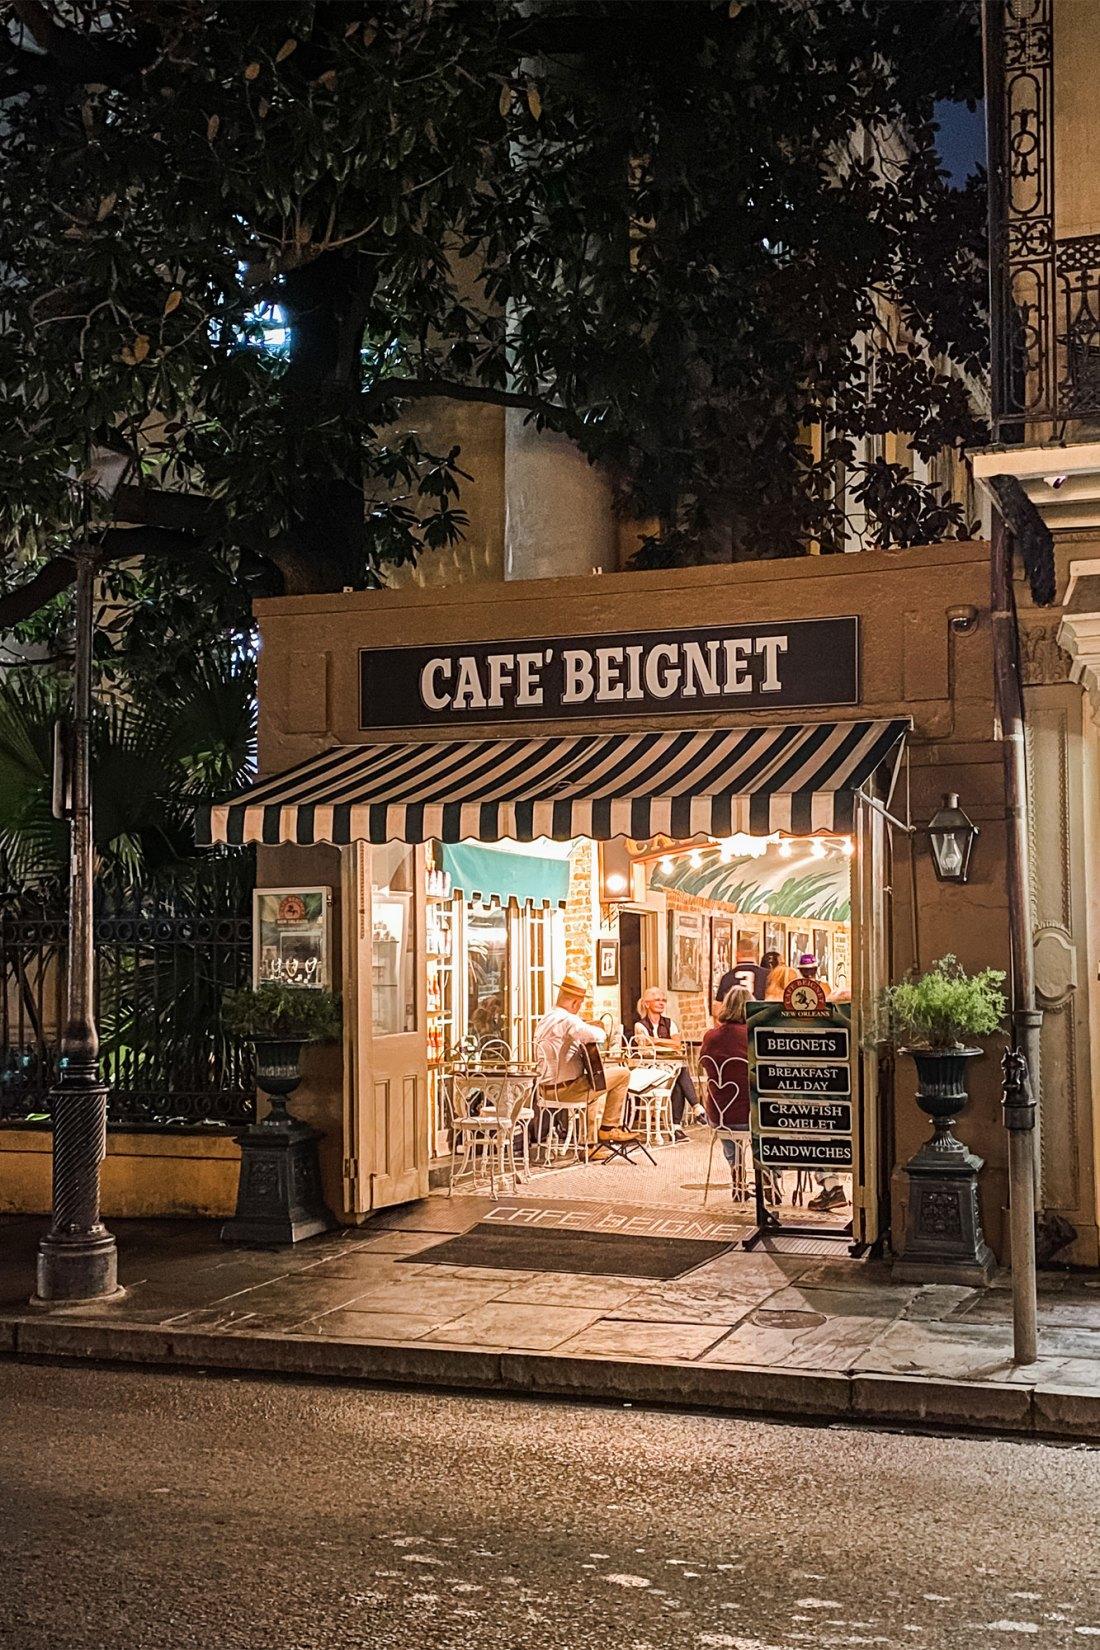 Small cafe at night